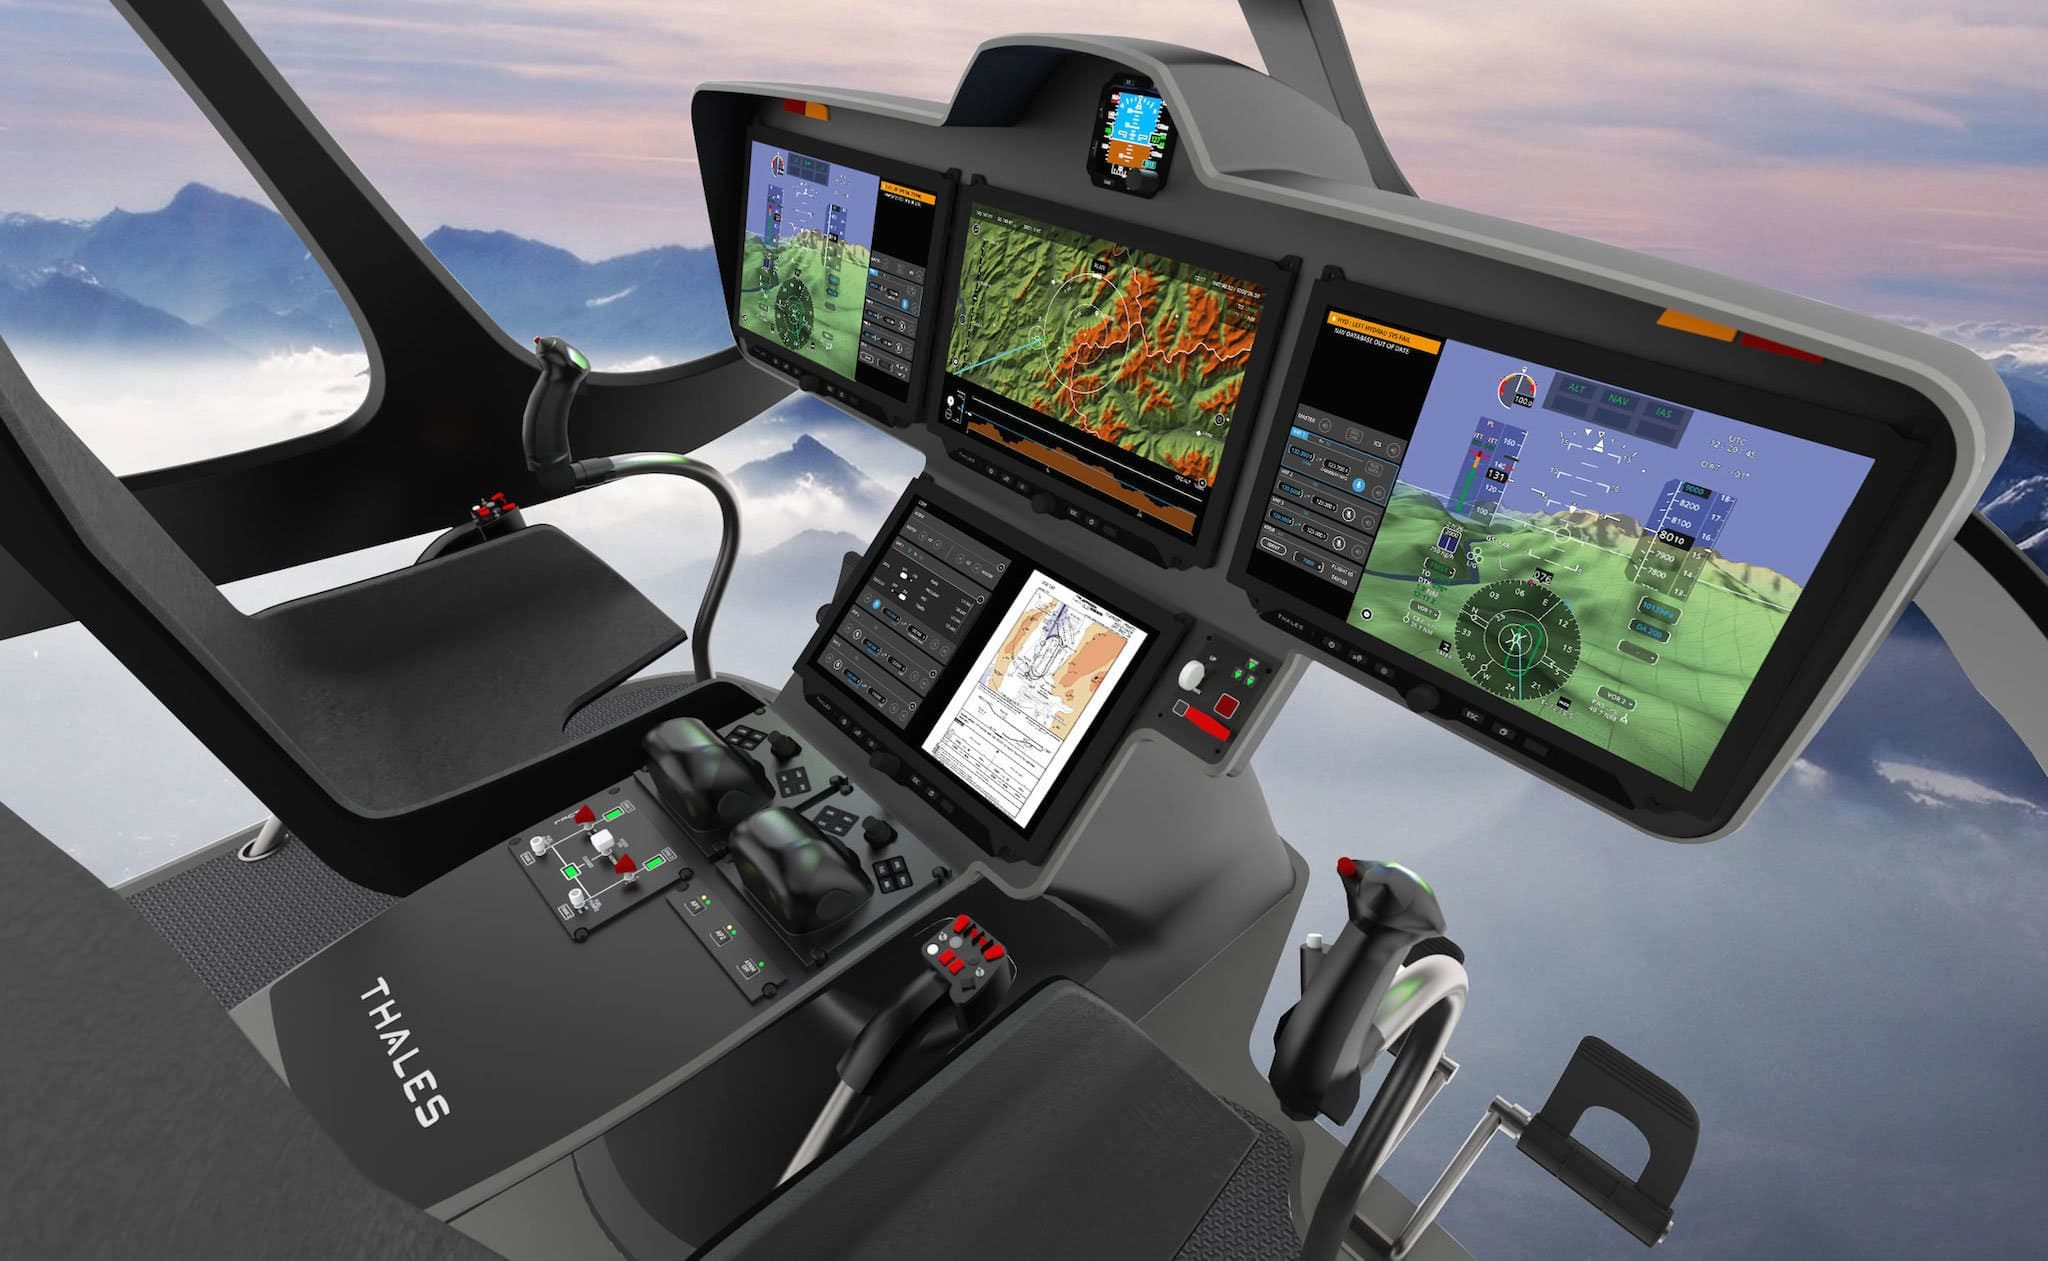 Thales_Avionics_FlytX_helicopter-2048x12